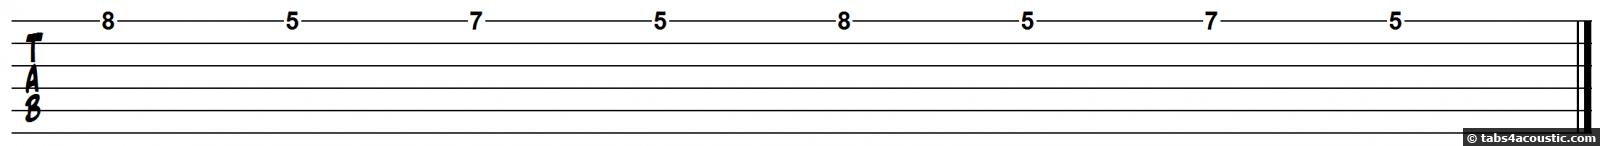 Deuxième exercice, variation 1